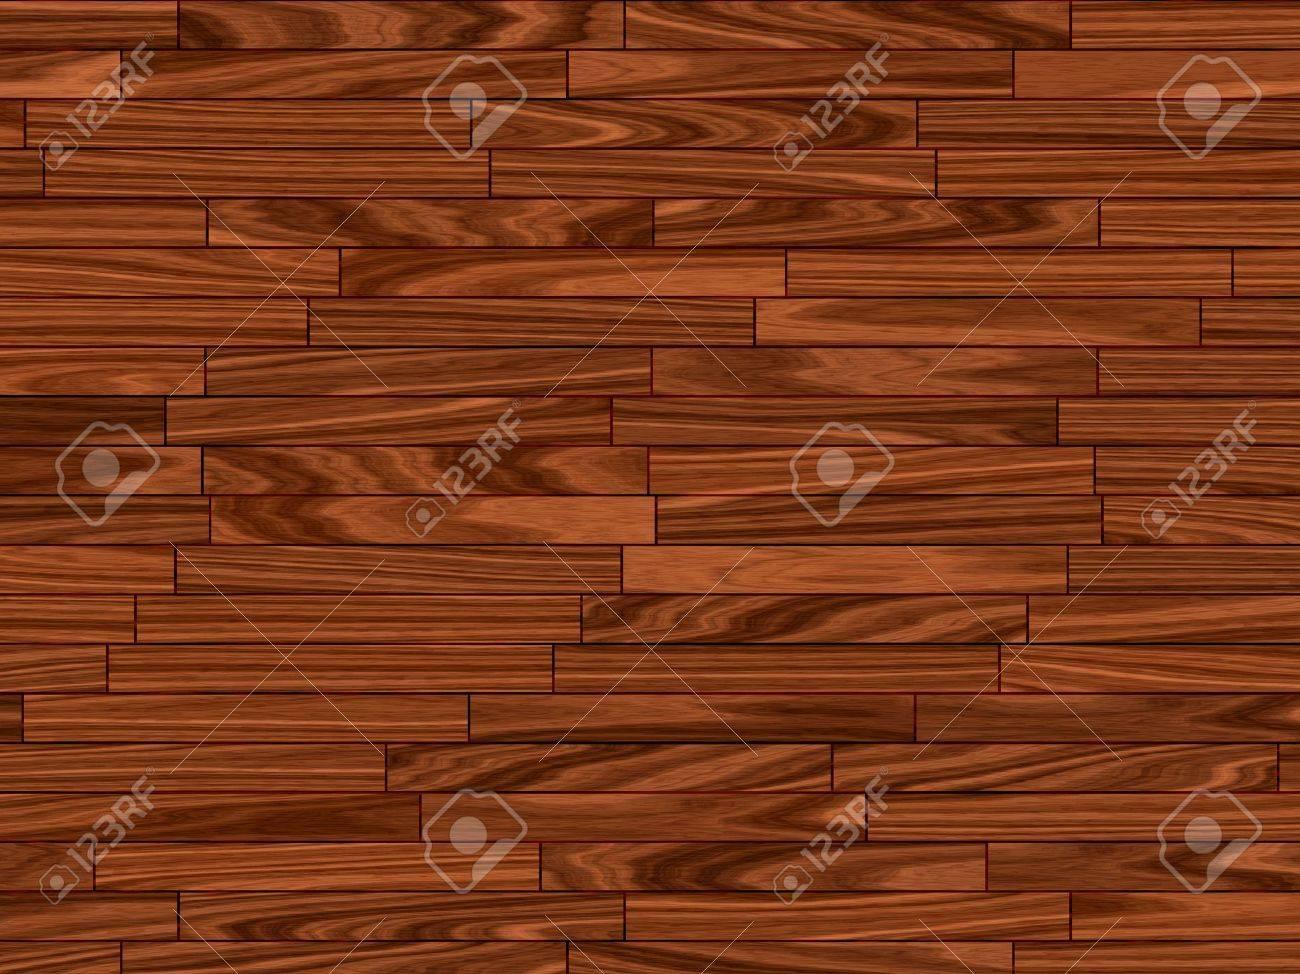 close up of warm brown parquet flooring pattern Stock Photo - 3297747